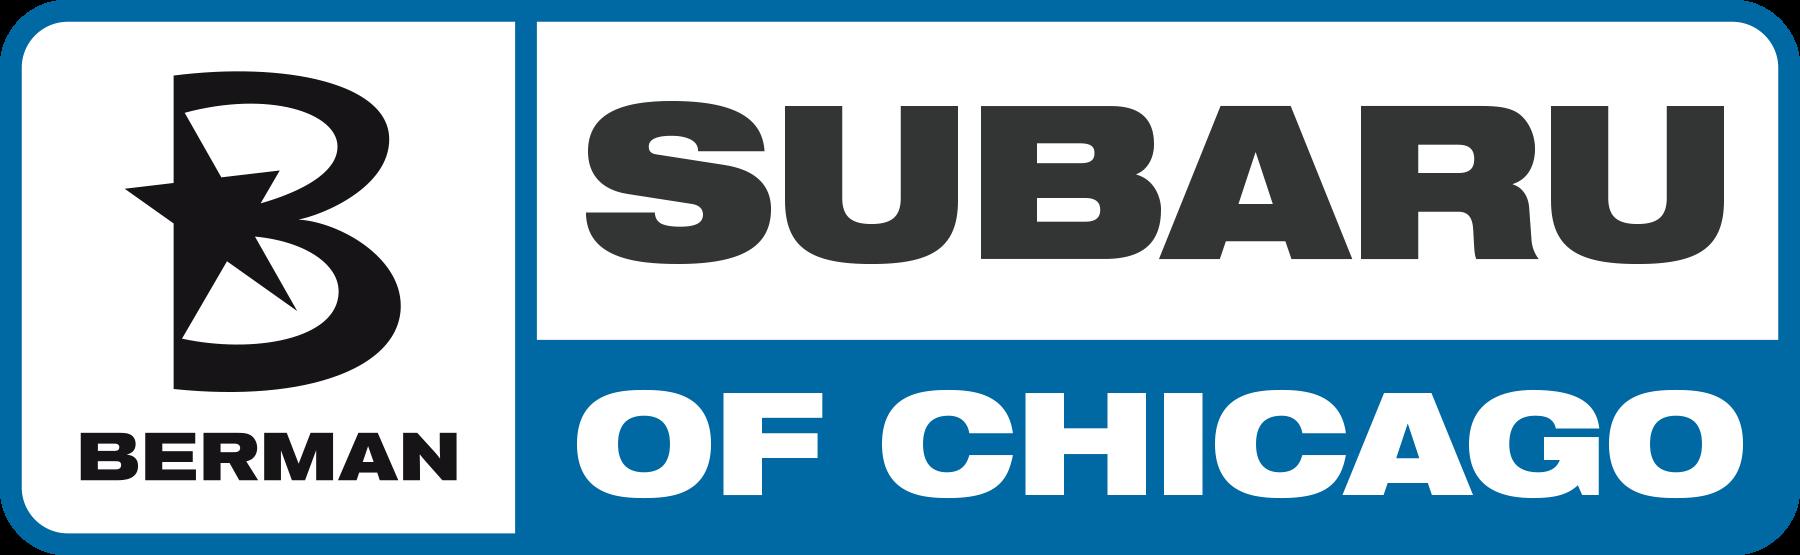 SubaruOfChicago-Logo-CMYK copy.png